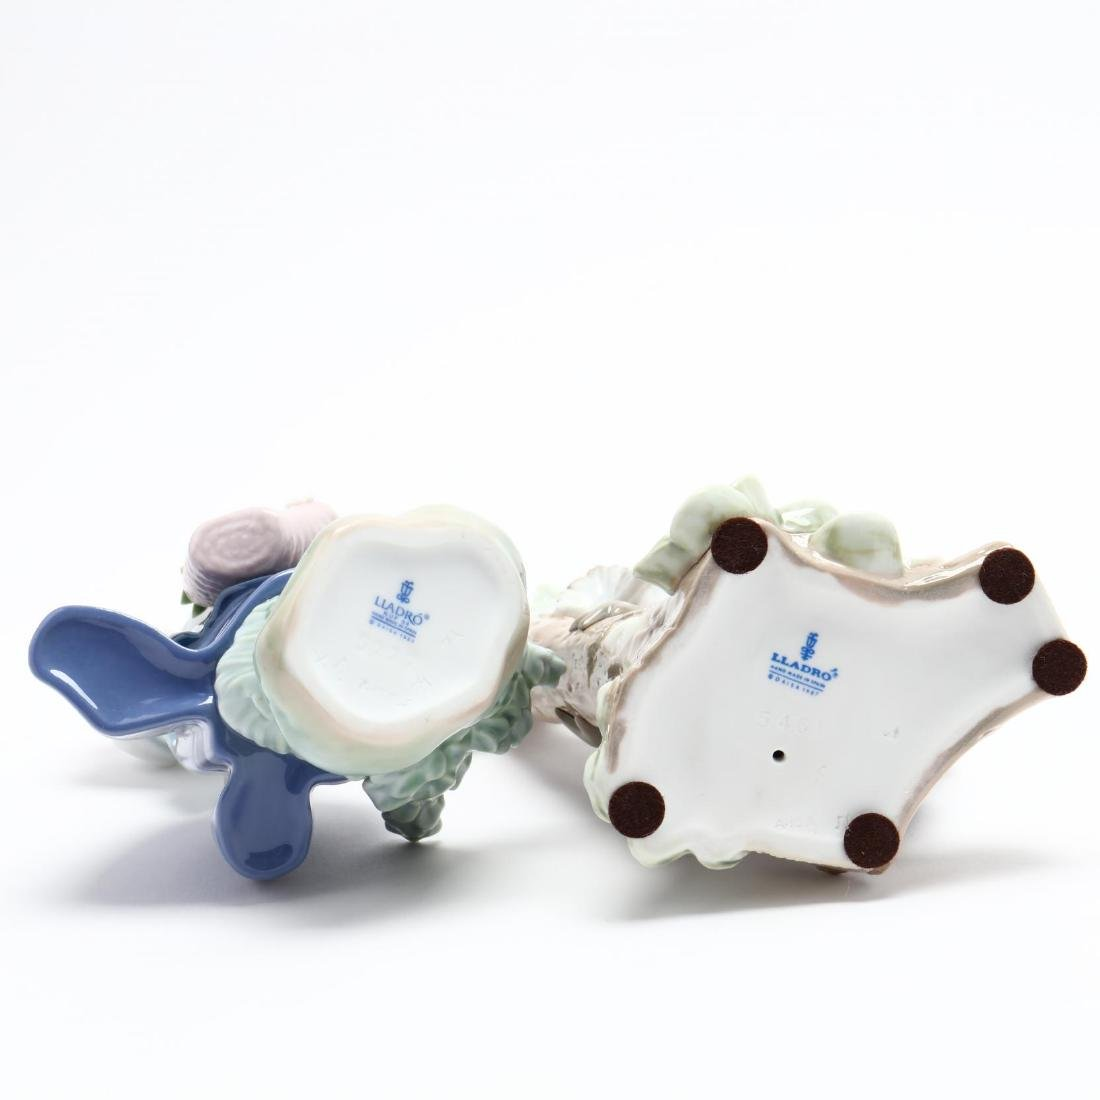 Five Porcelain Figures, Lladro and Royal Doulton - 4